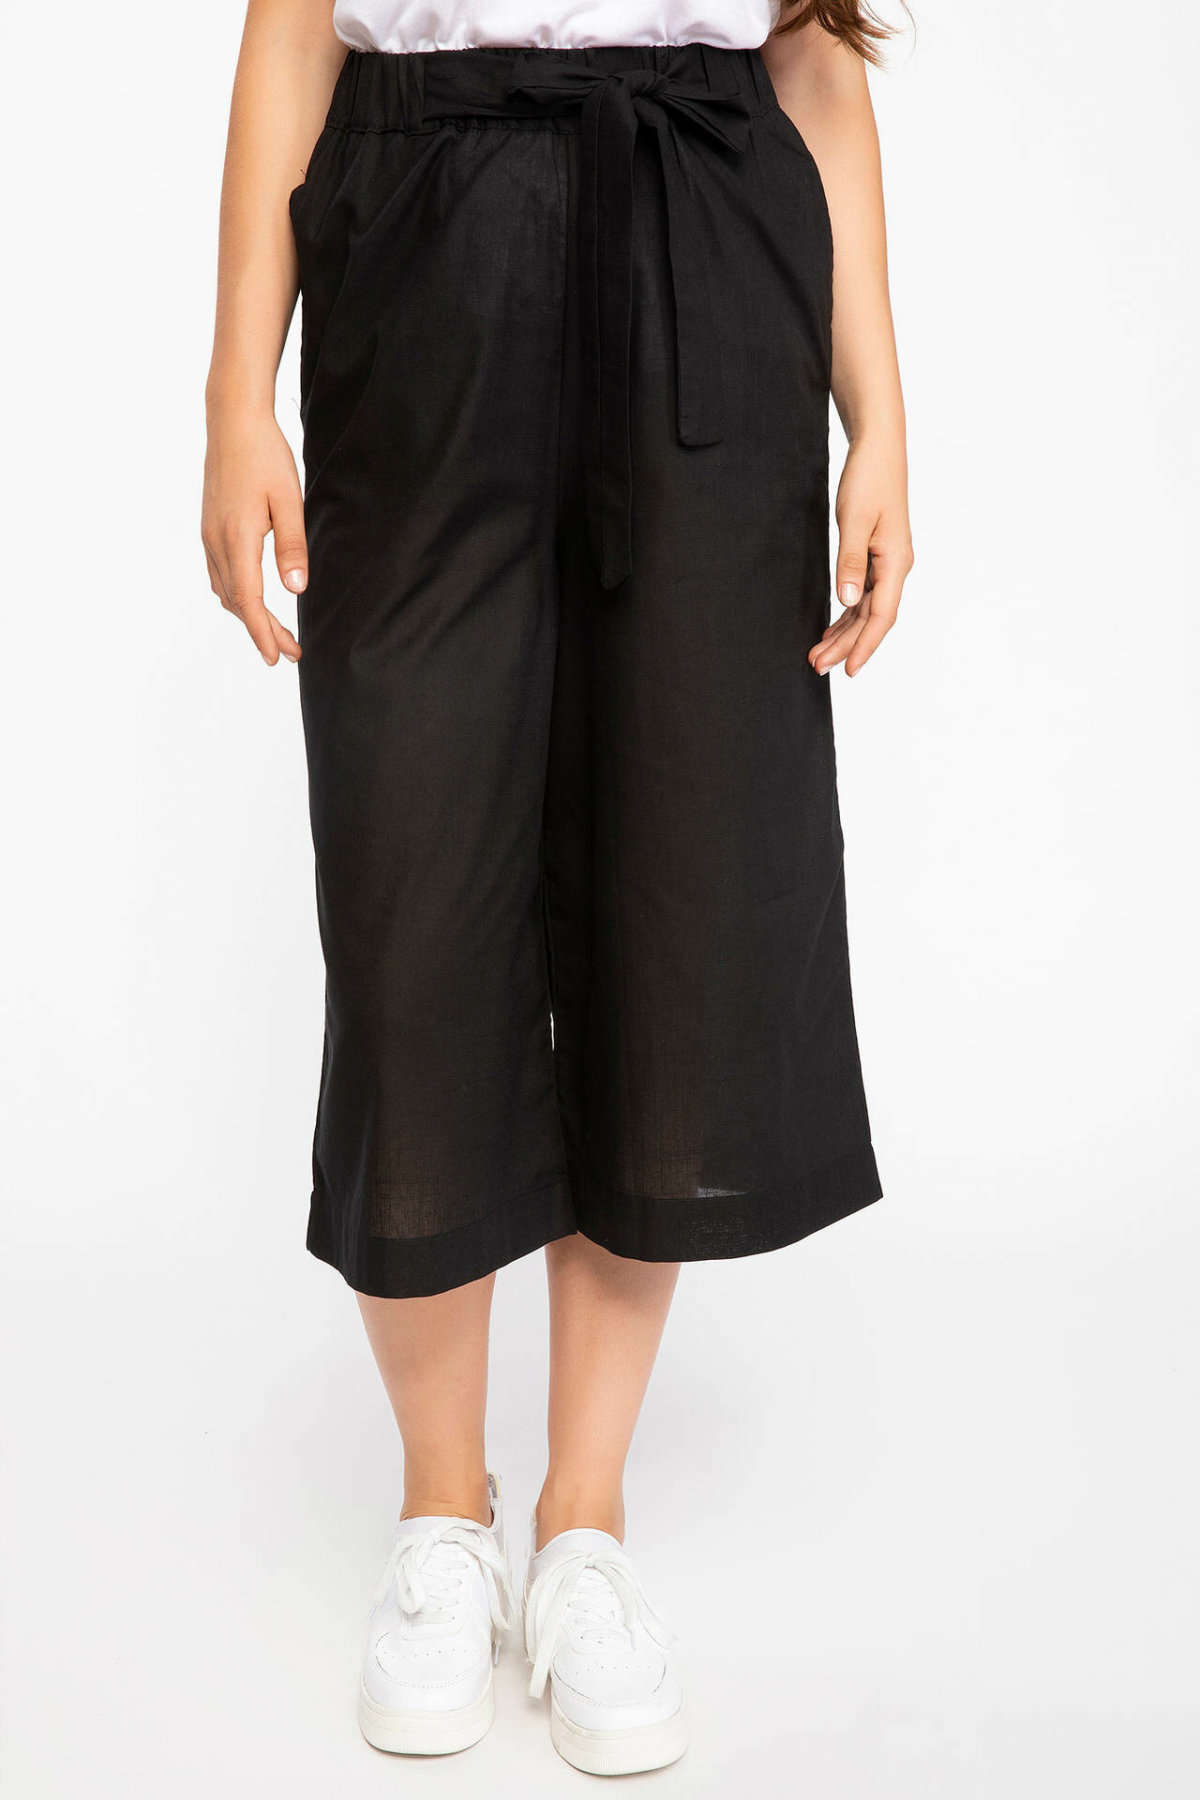 DeFacto Fashion Ladies Striped Loose Trousers For Women's Casual Pants Straight Comfort Crop Pants Female New - K1147AZ18AU